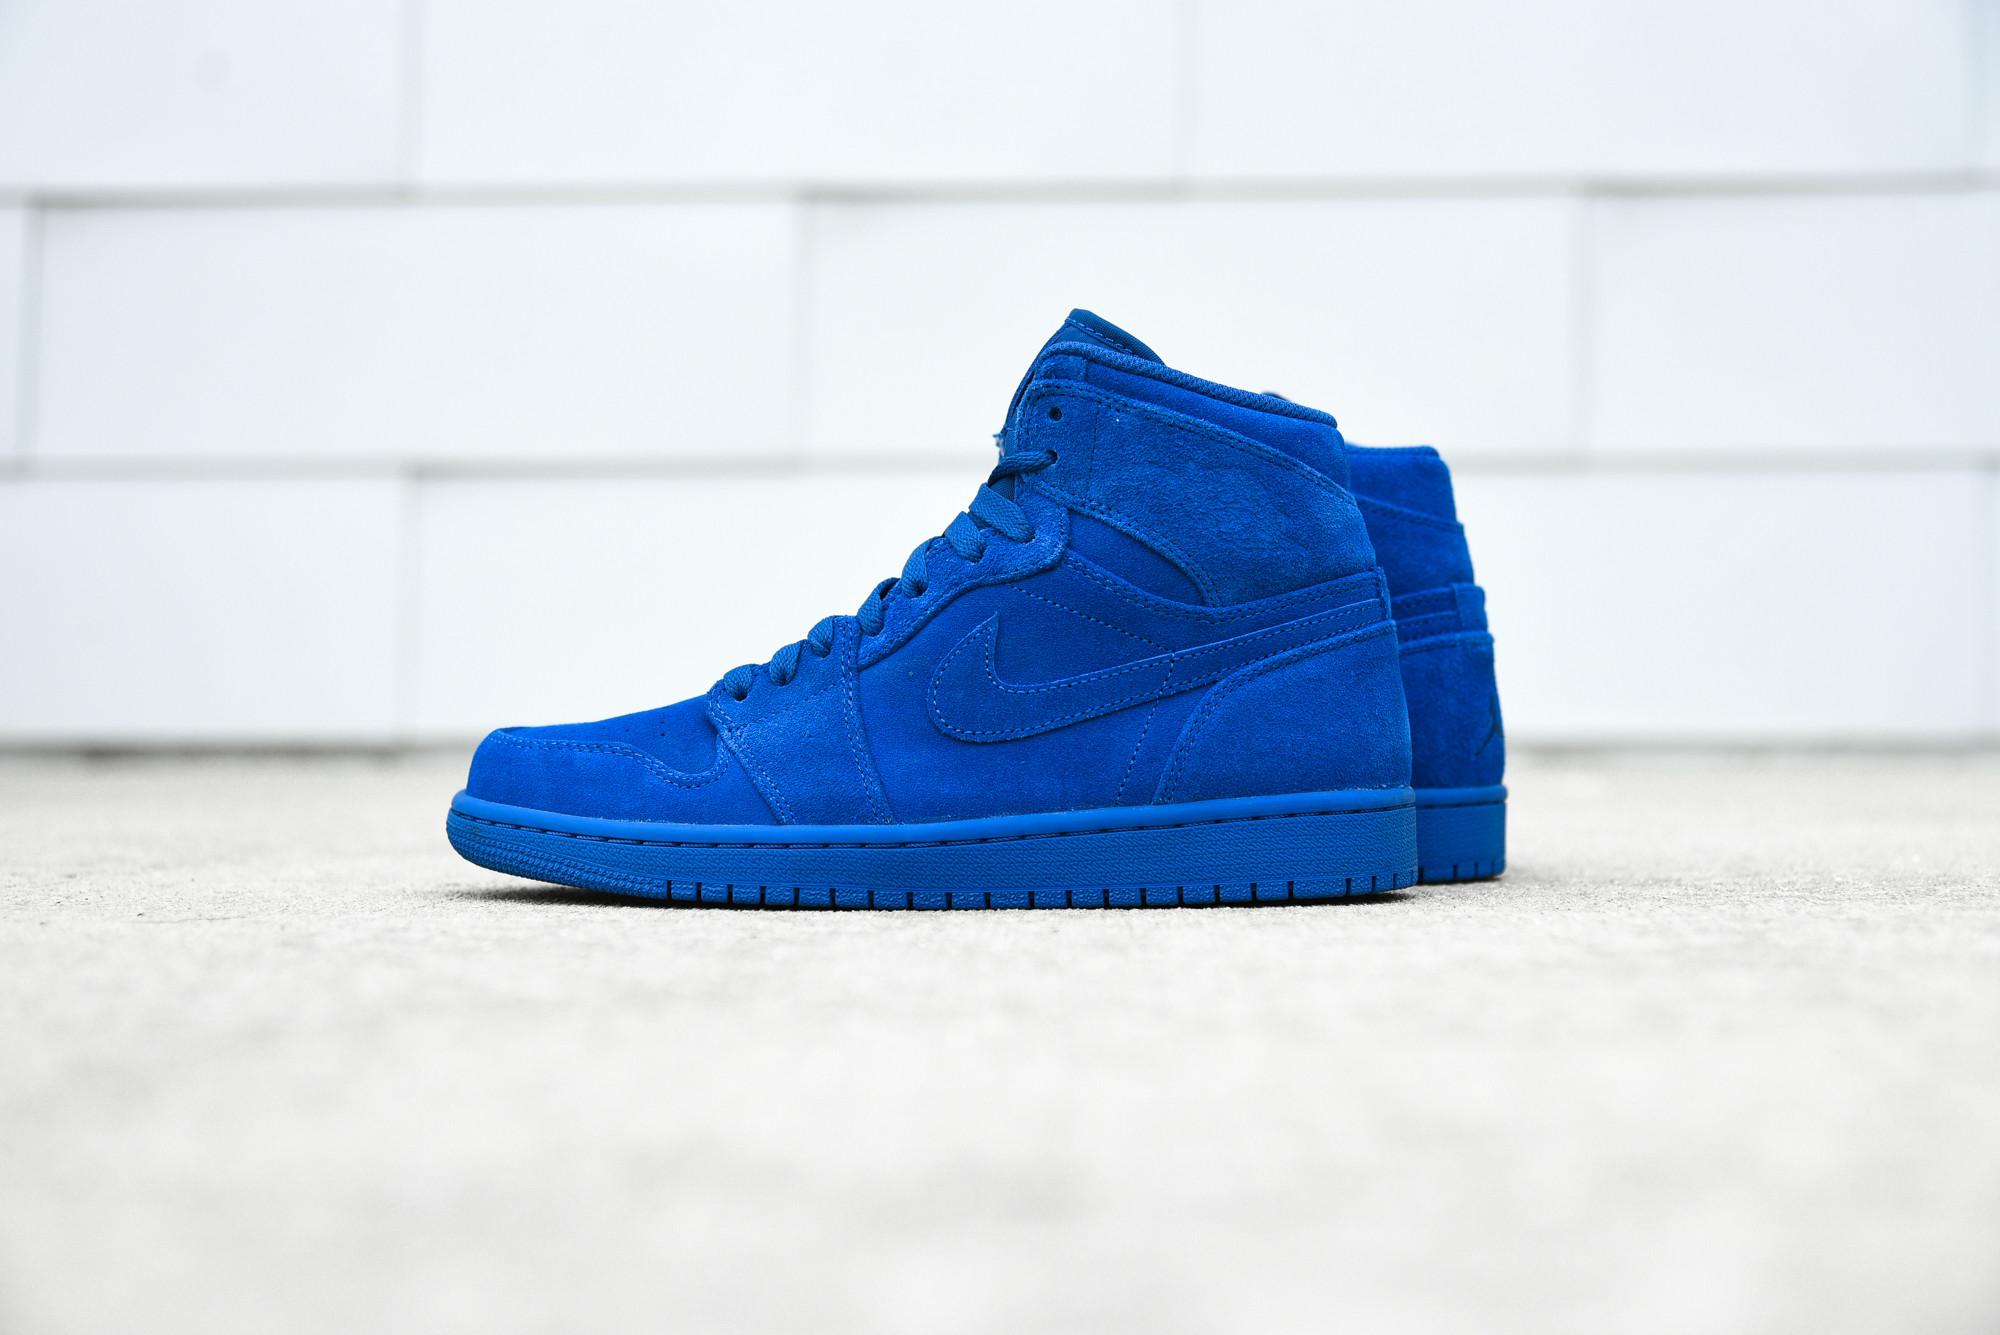 Air Jordan 1 High Blue Suede